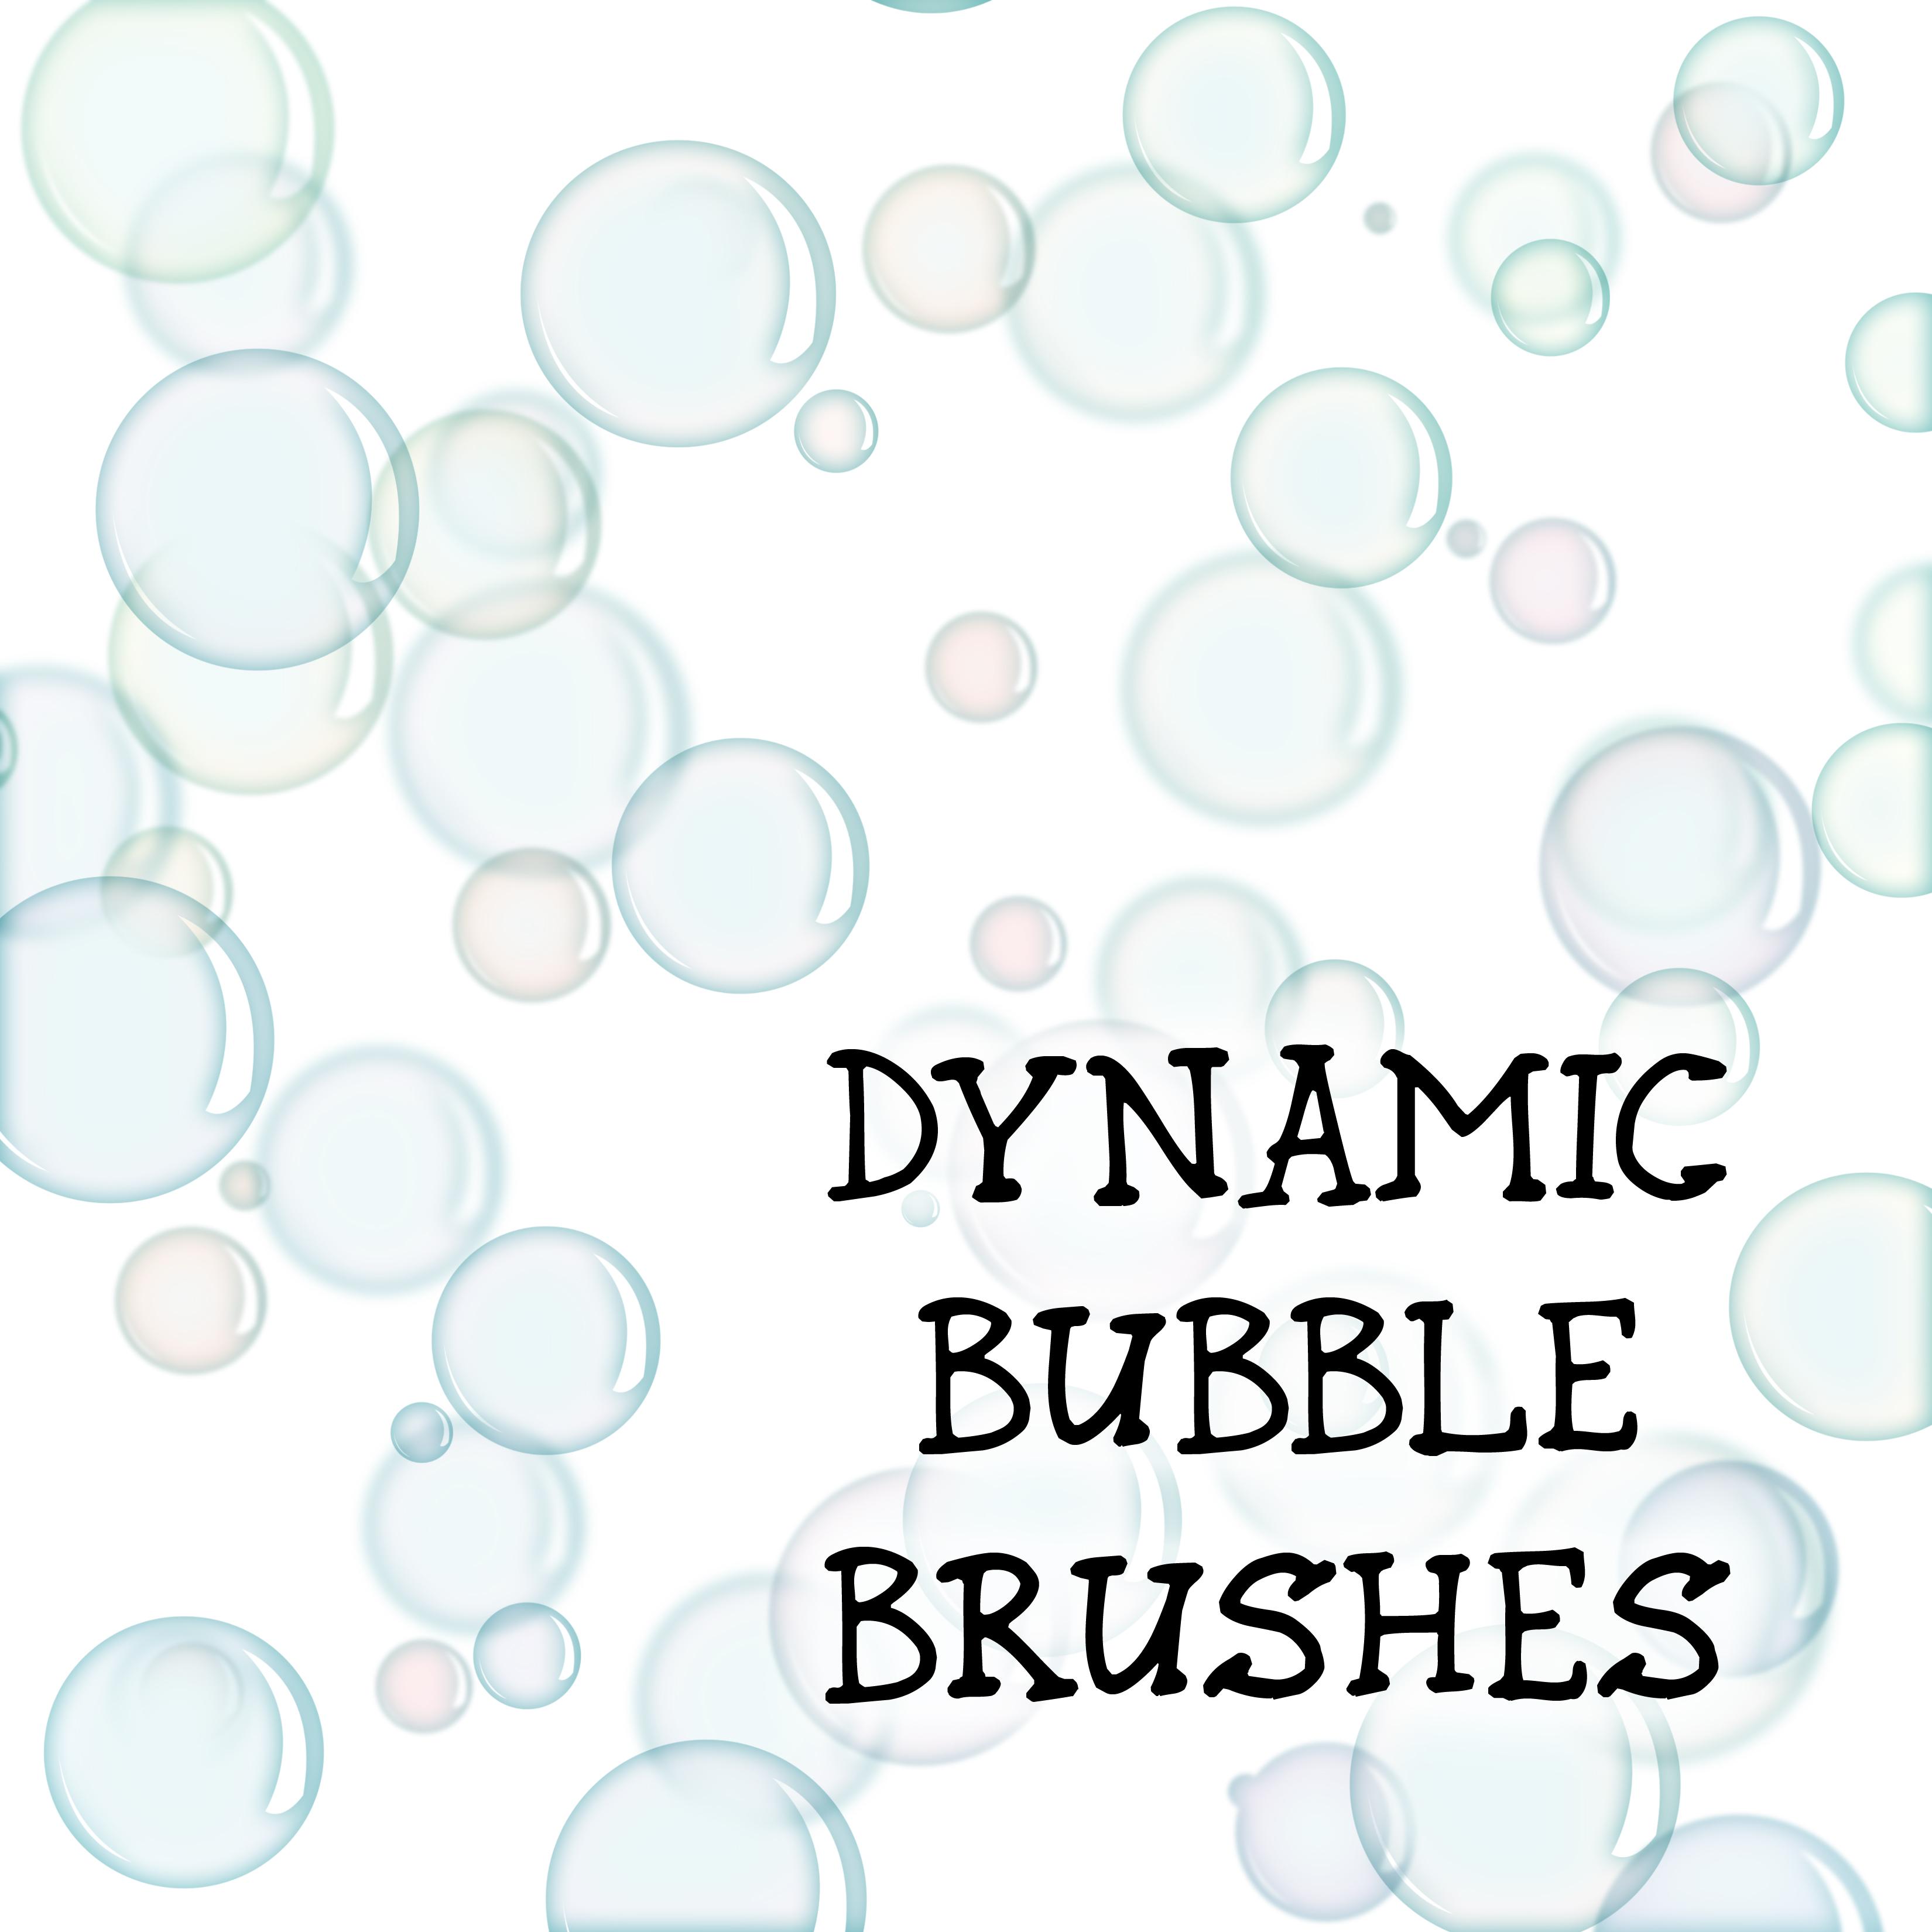 Dynamic Bubble Brushes